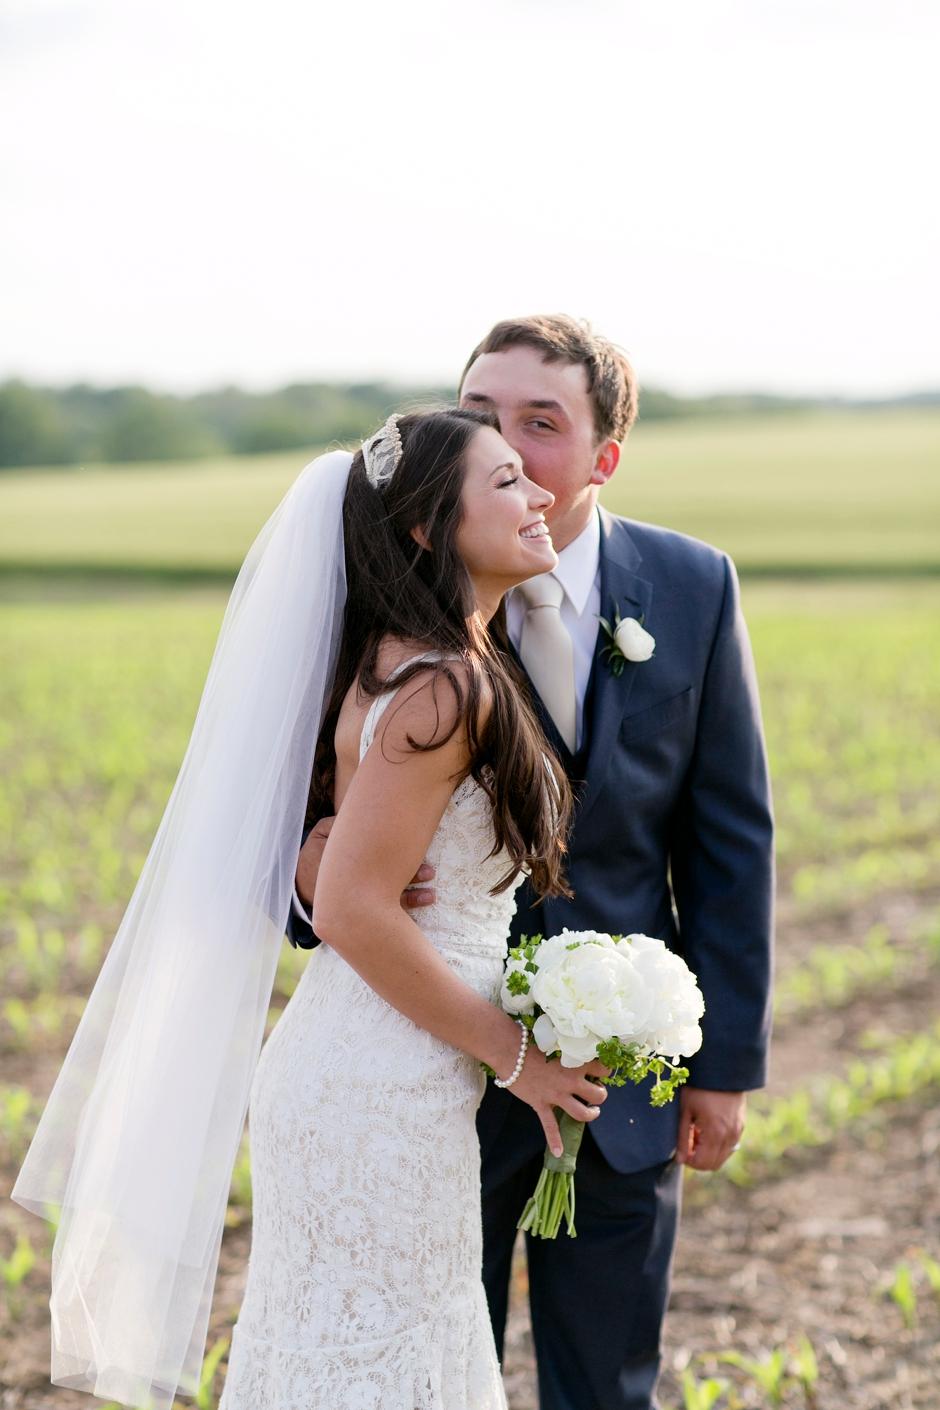 langley-farm-bourbon-wedding-spring-cream-bride-woodford-743